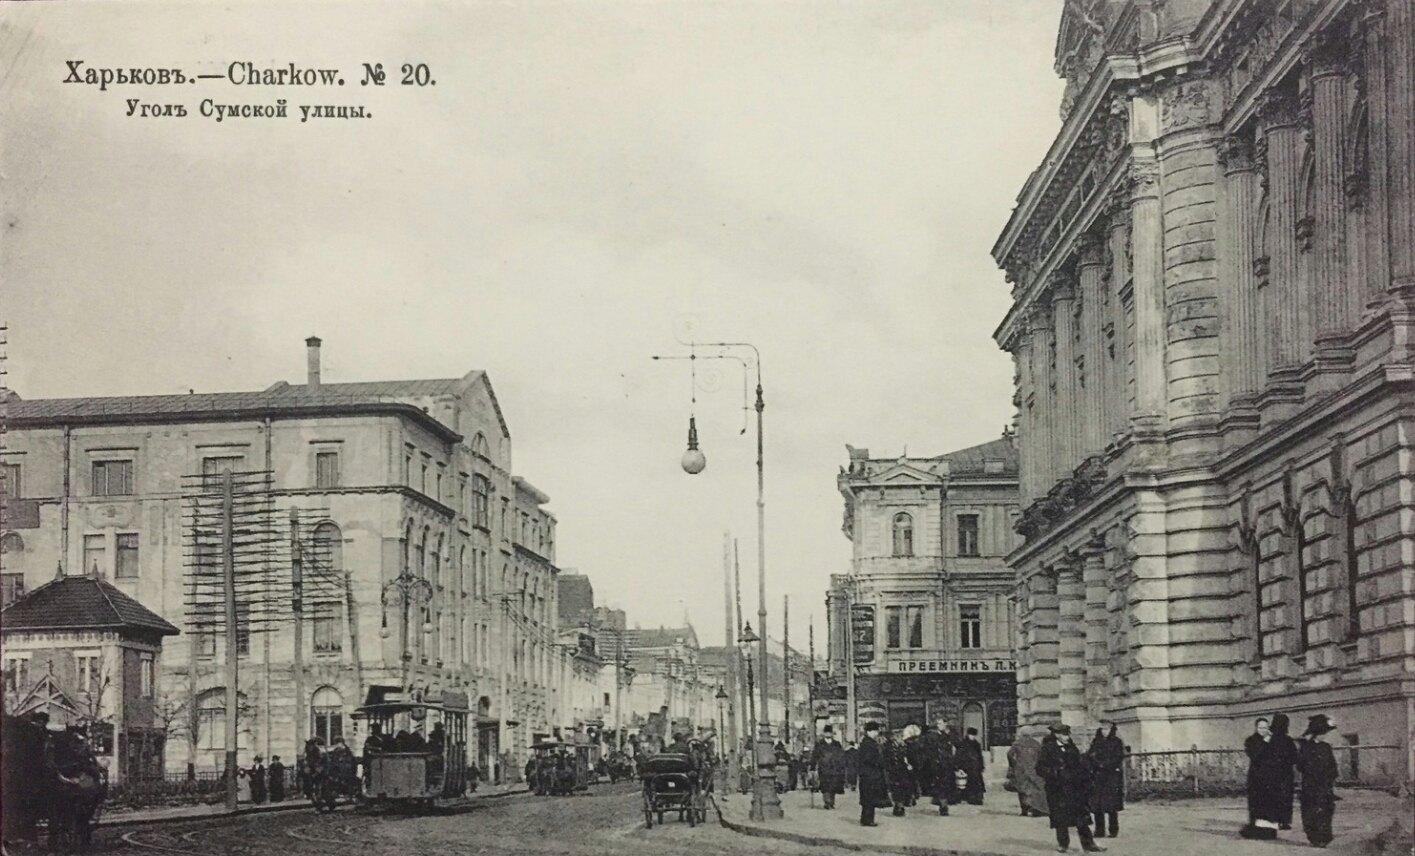 Угол Сумской улицы